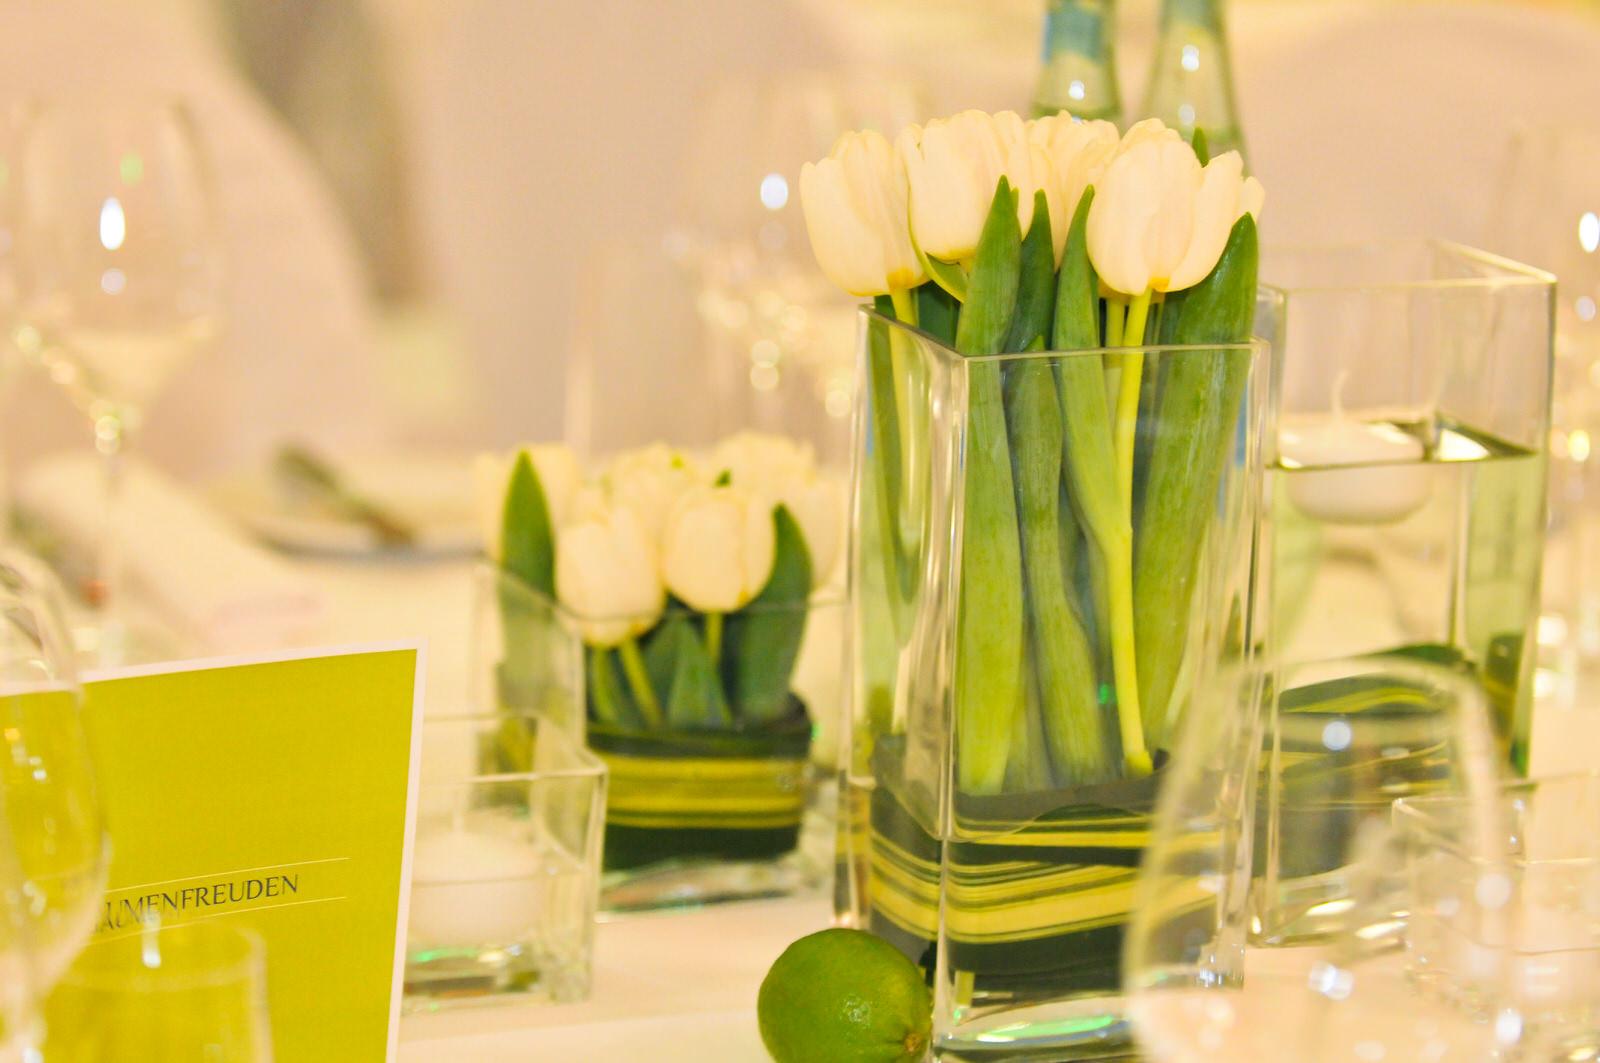 tuscany-wedding-planners-floristen-46.jpg